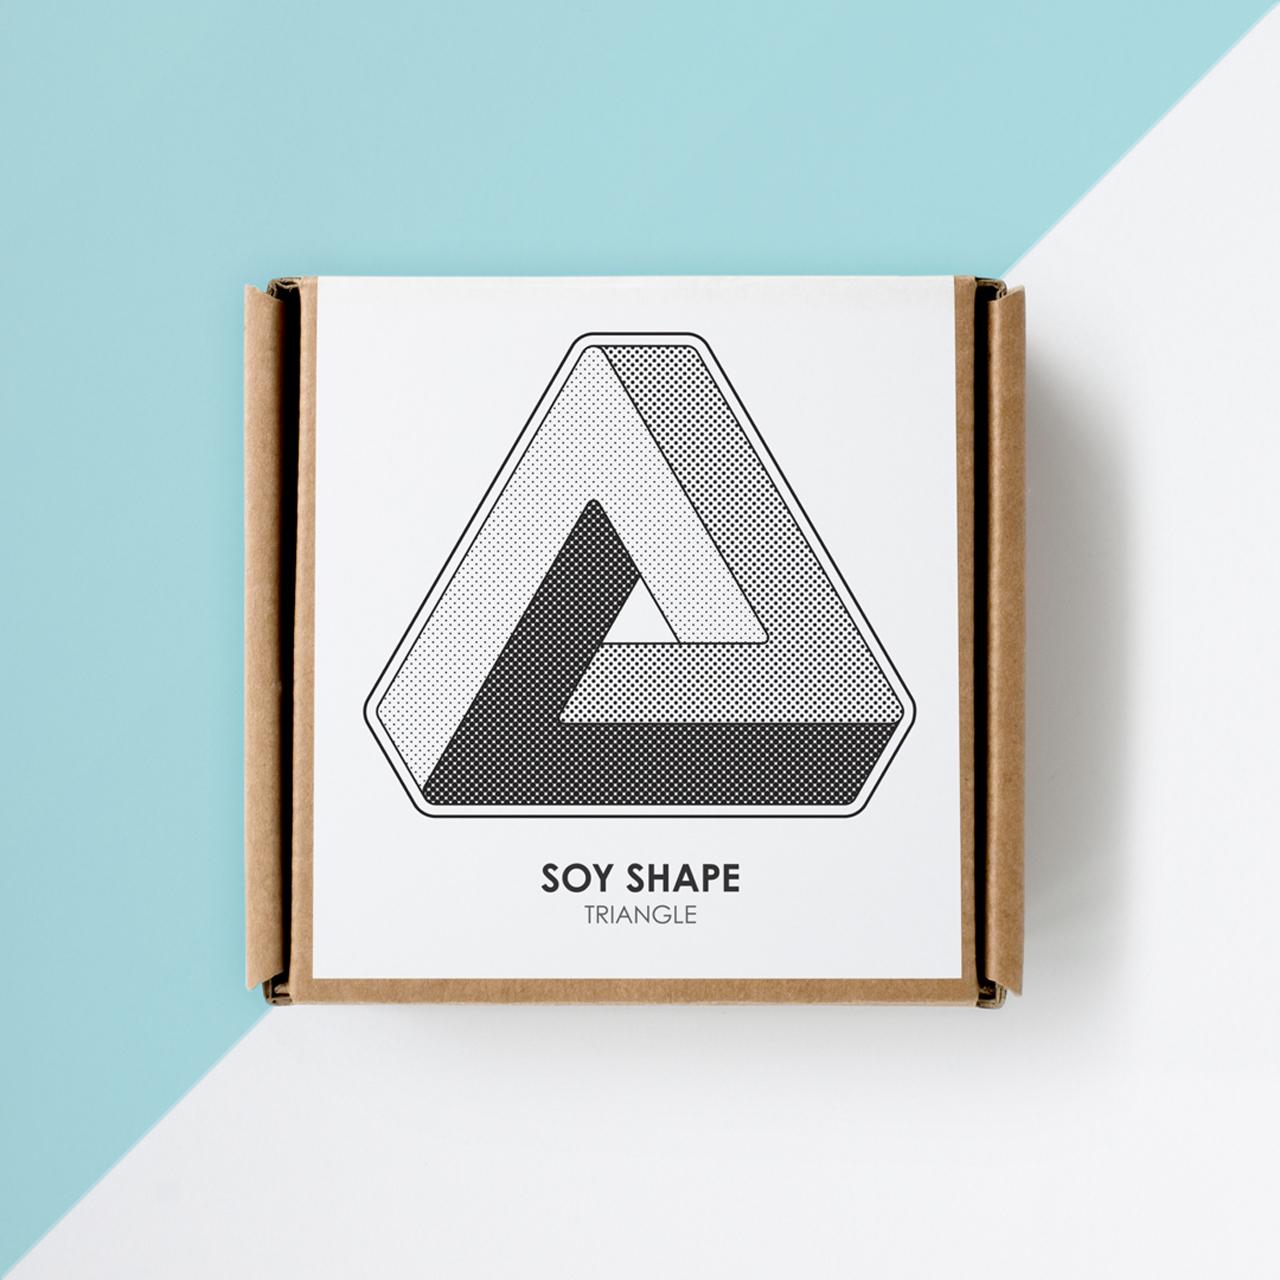 10_Duncan-Shotton_Soy-Shape_Box_paper.jpg